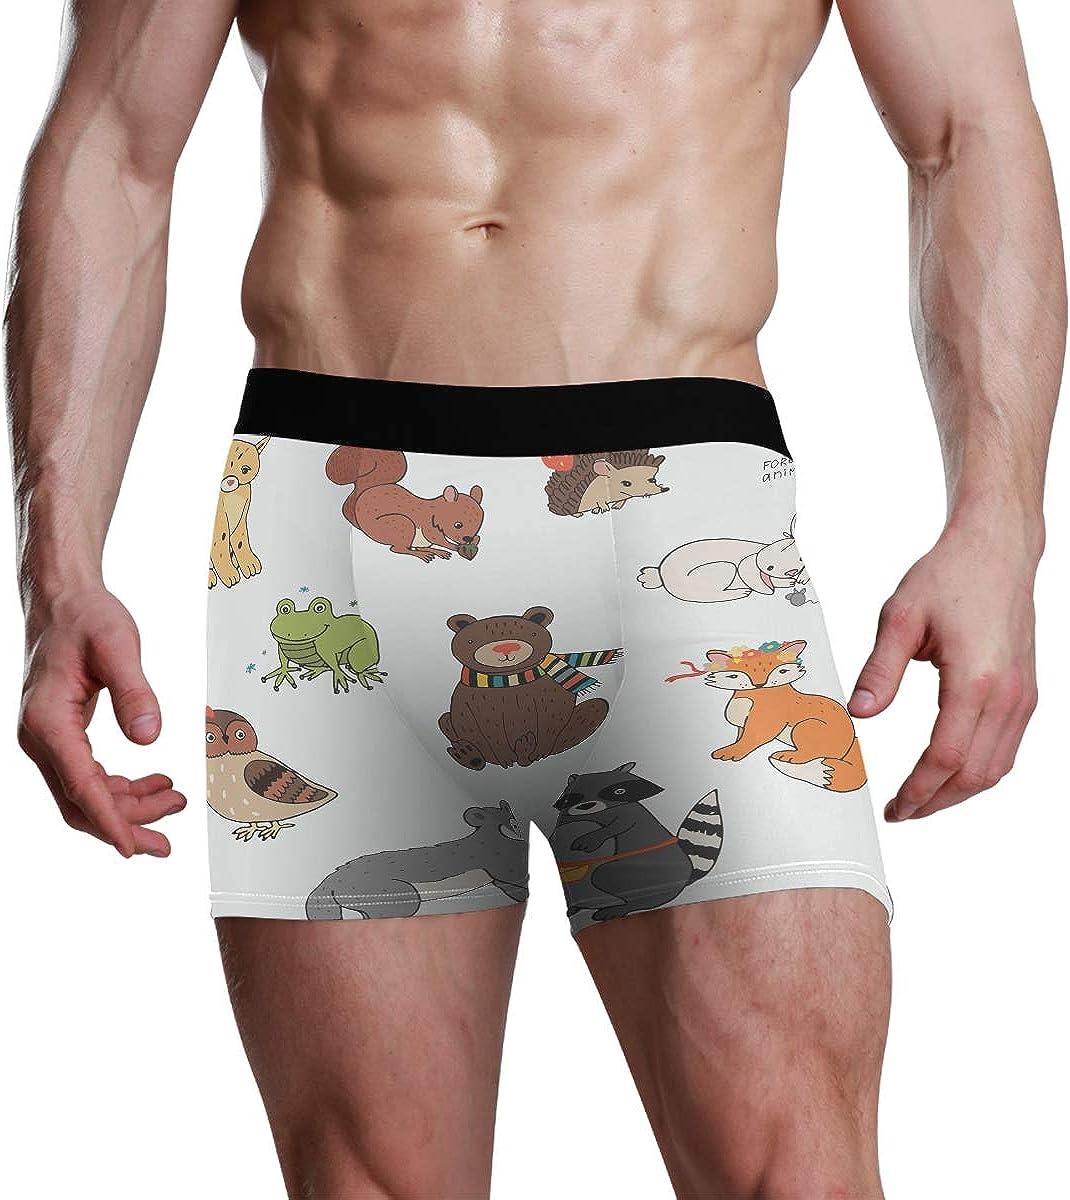 Men's Boxer Briefs Forest Animals Vector Illustrations Set Bikini Underwear Stretch Trunks Boys Underpants